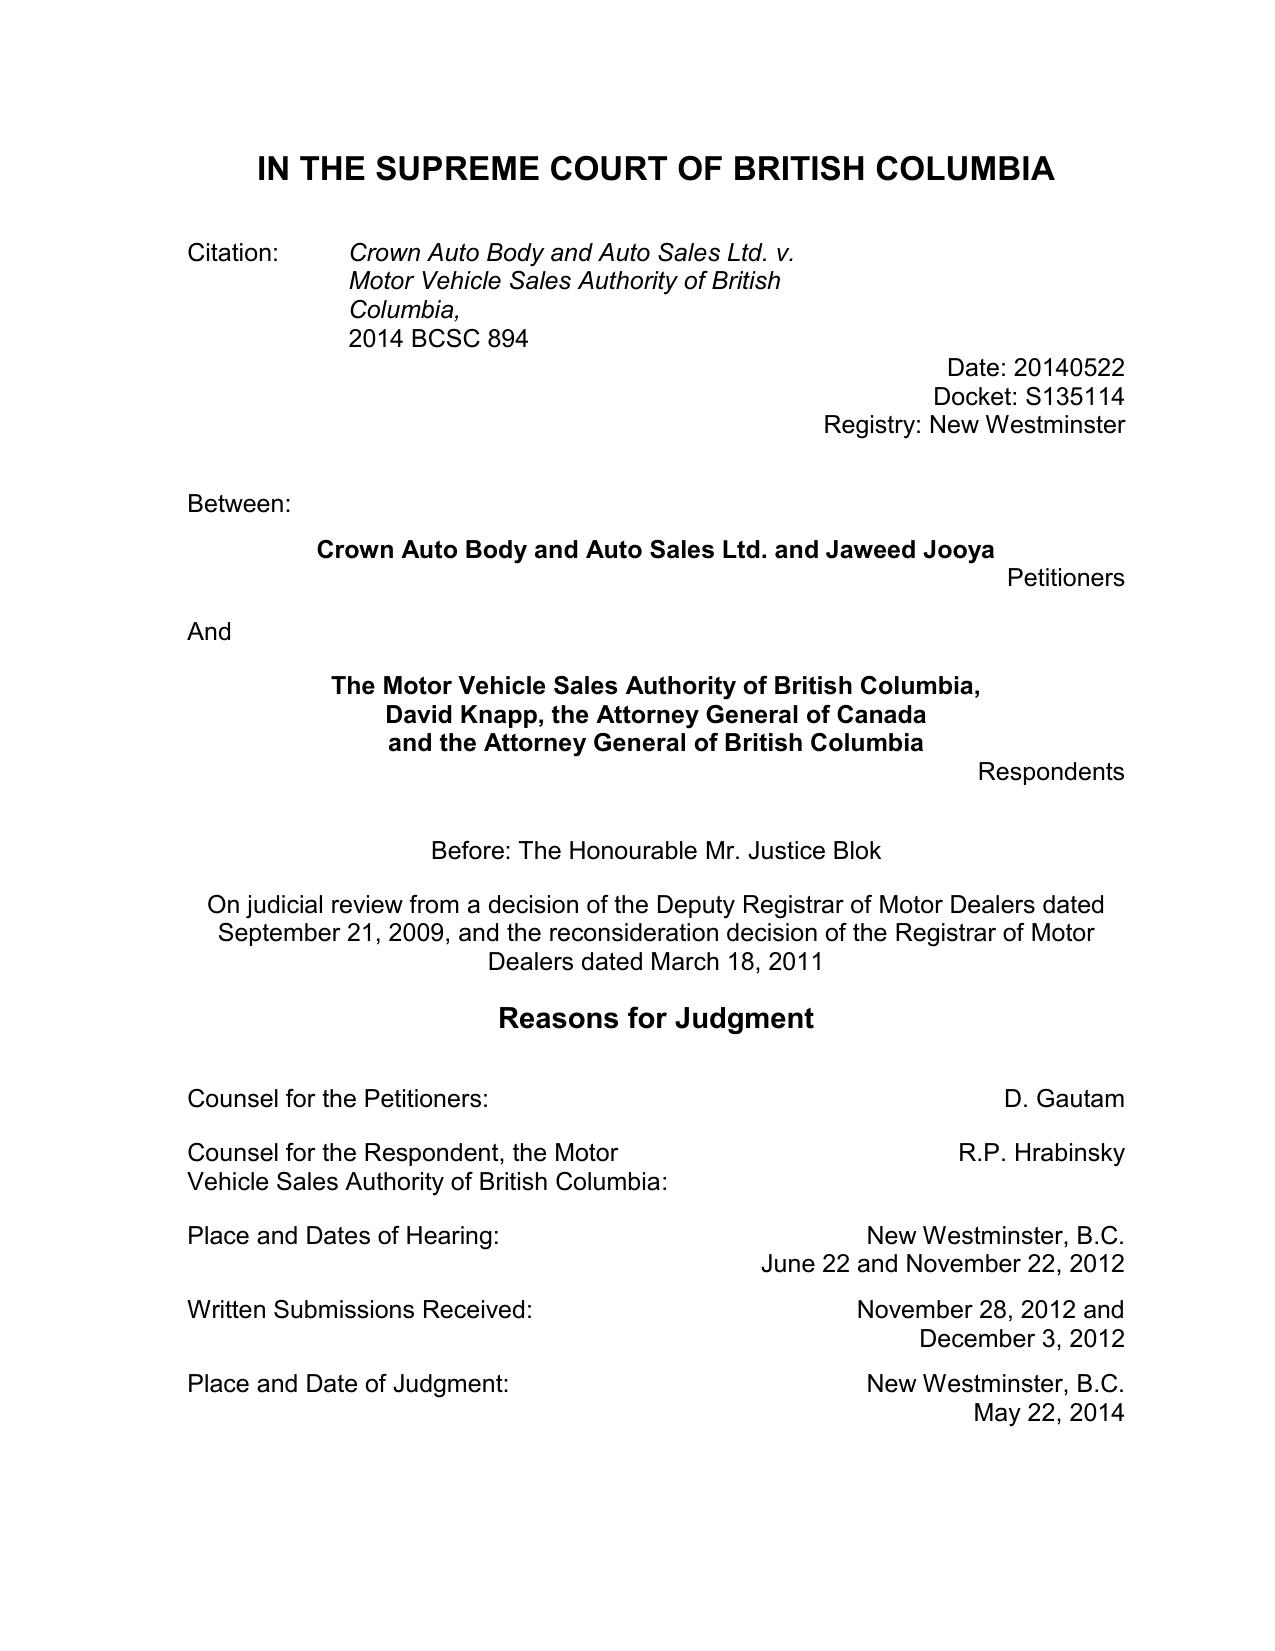 Judge Blok Re Crown Auto Body And Auto Sales Ltd V Motor Vehicle